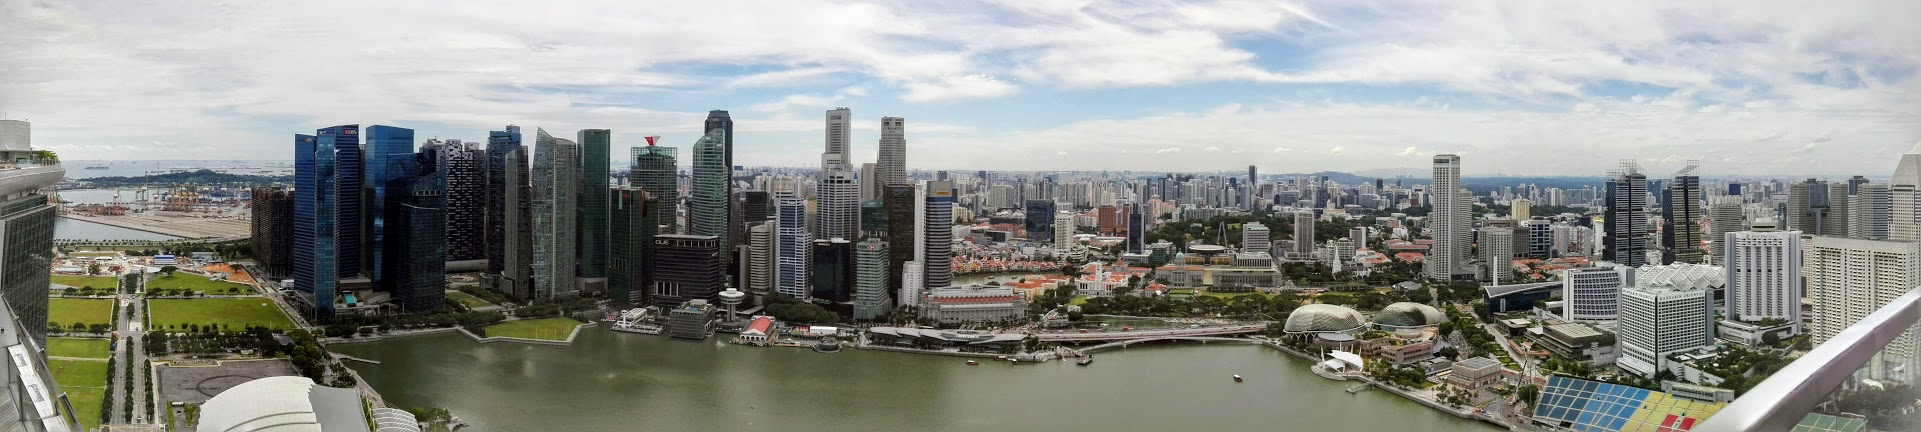 Geek Cat - Singapur - co zwiedzić - panorama Singapuru